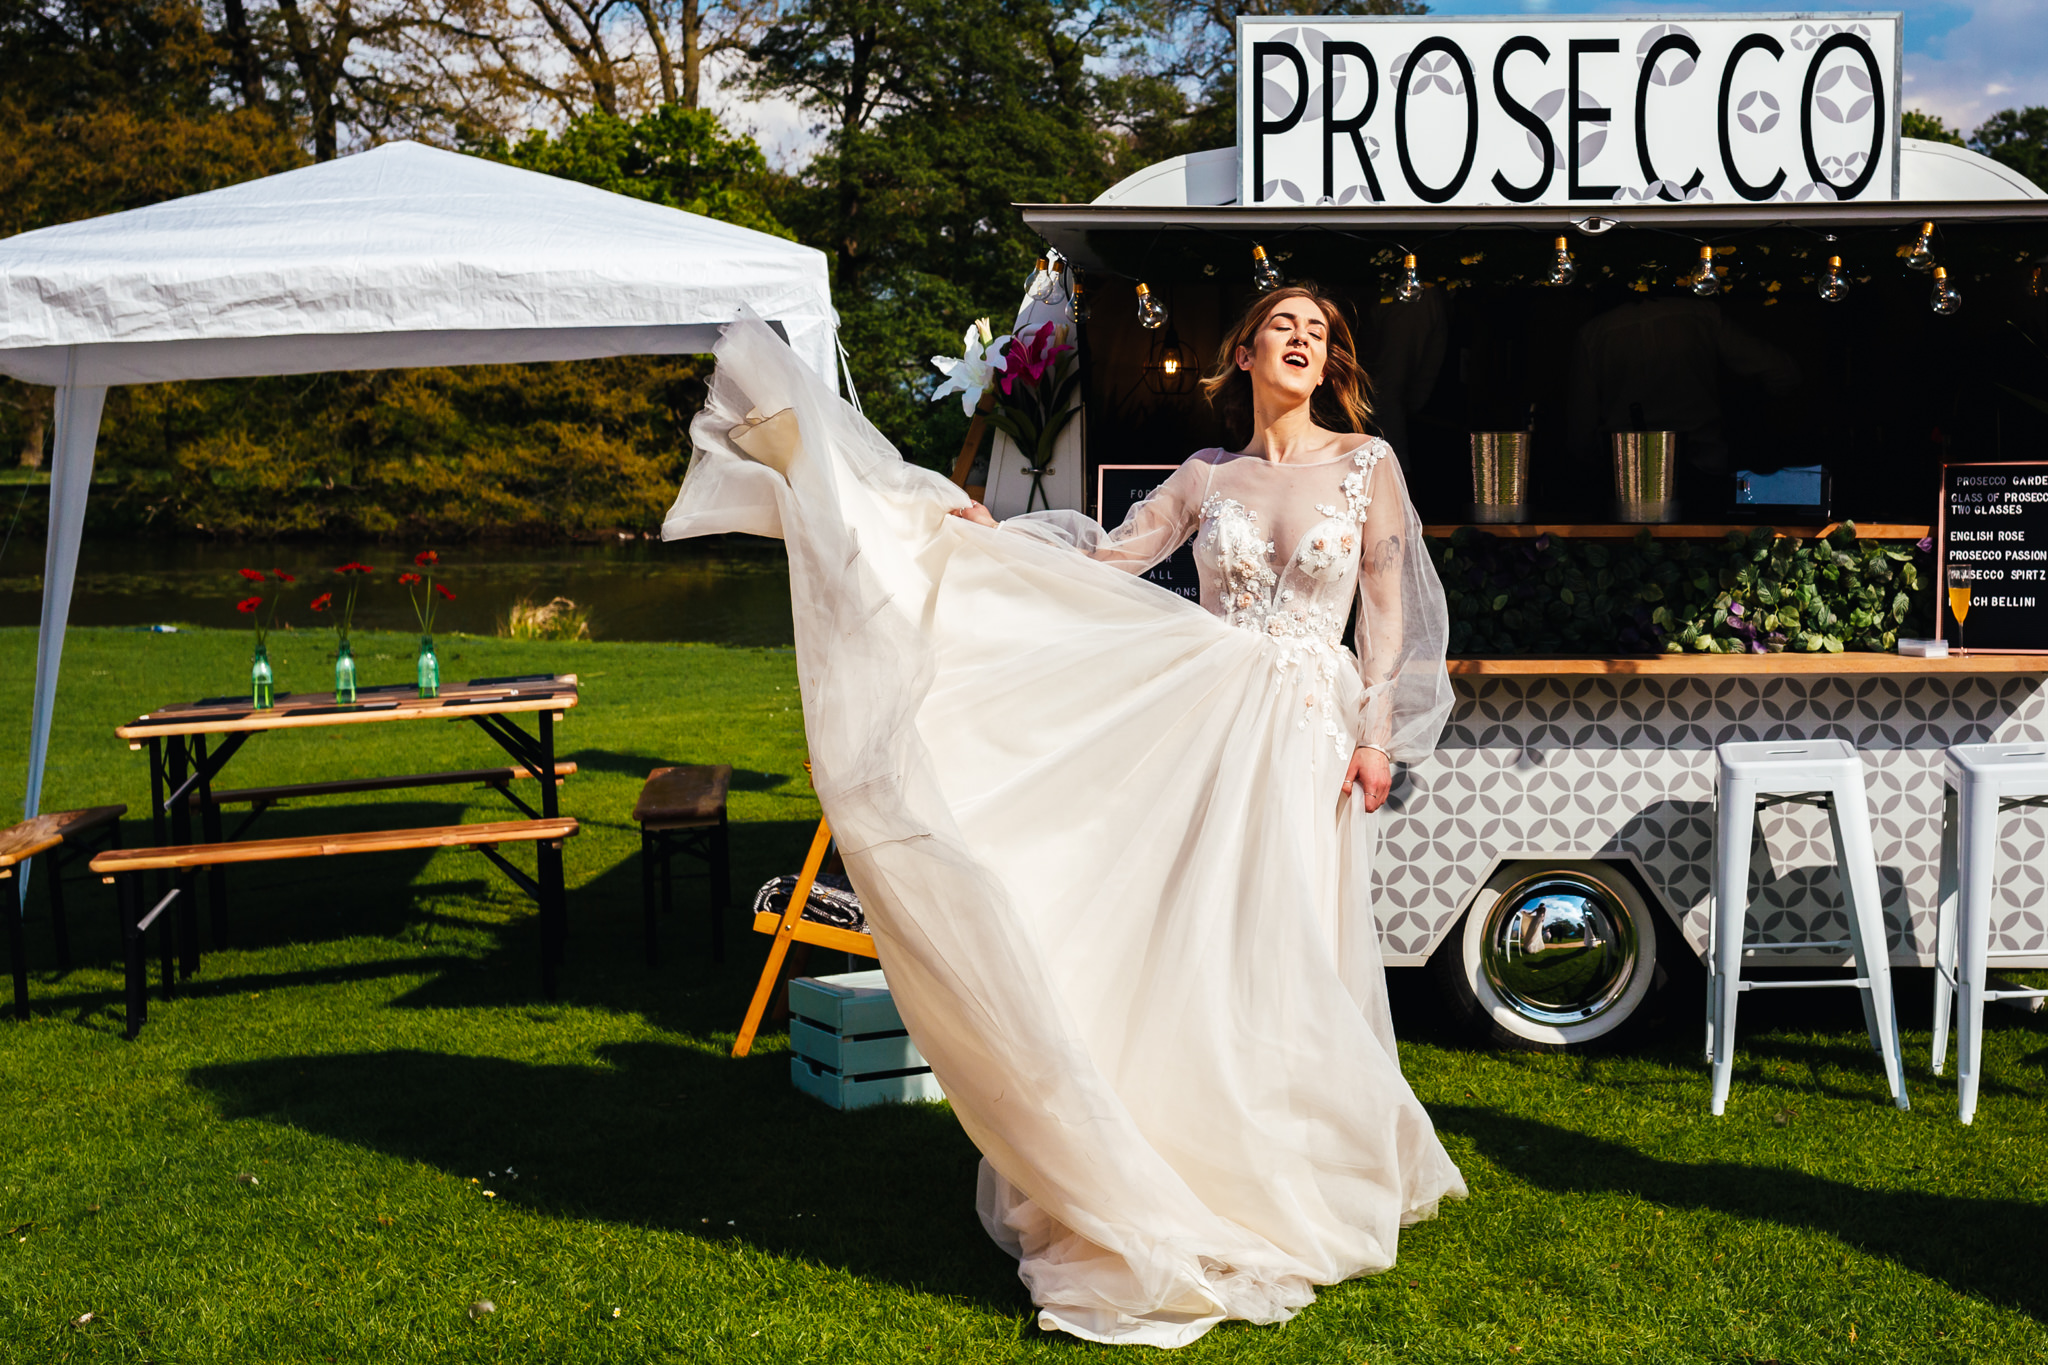 Outdoor Summer Wedding - Bride swishing in dress in front of prosecco